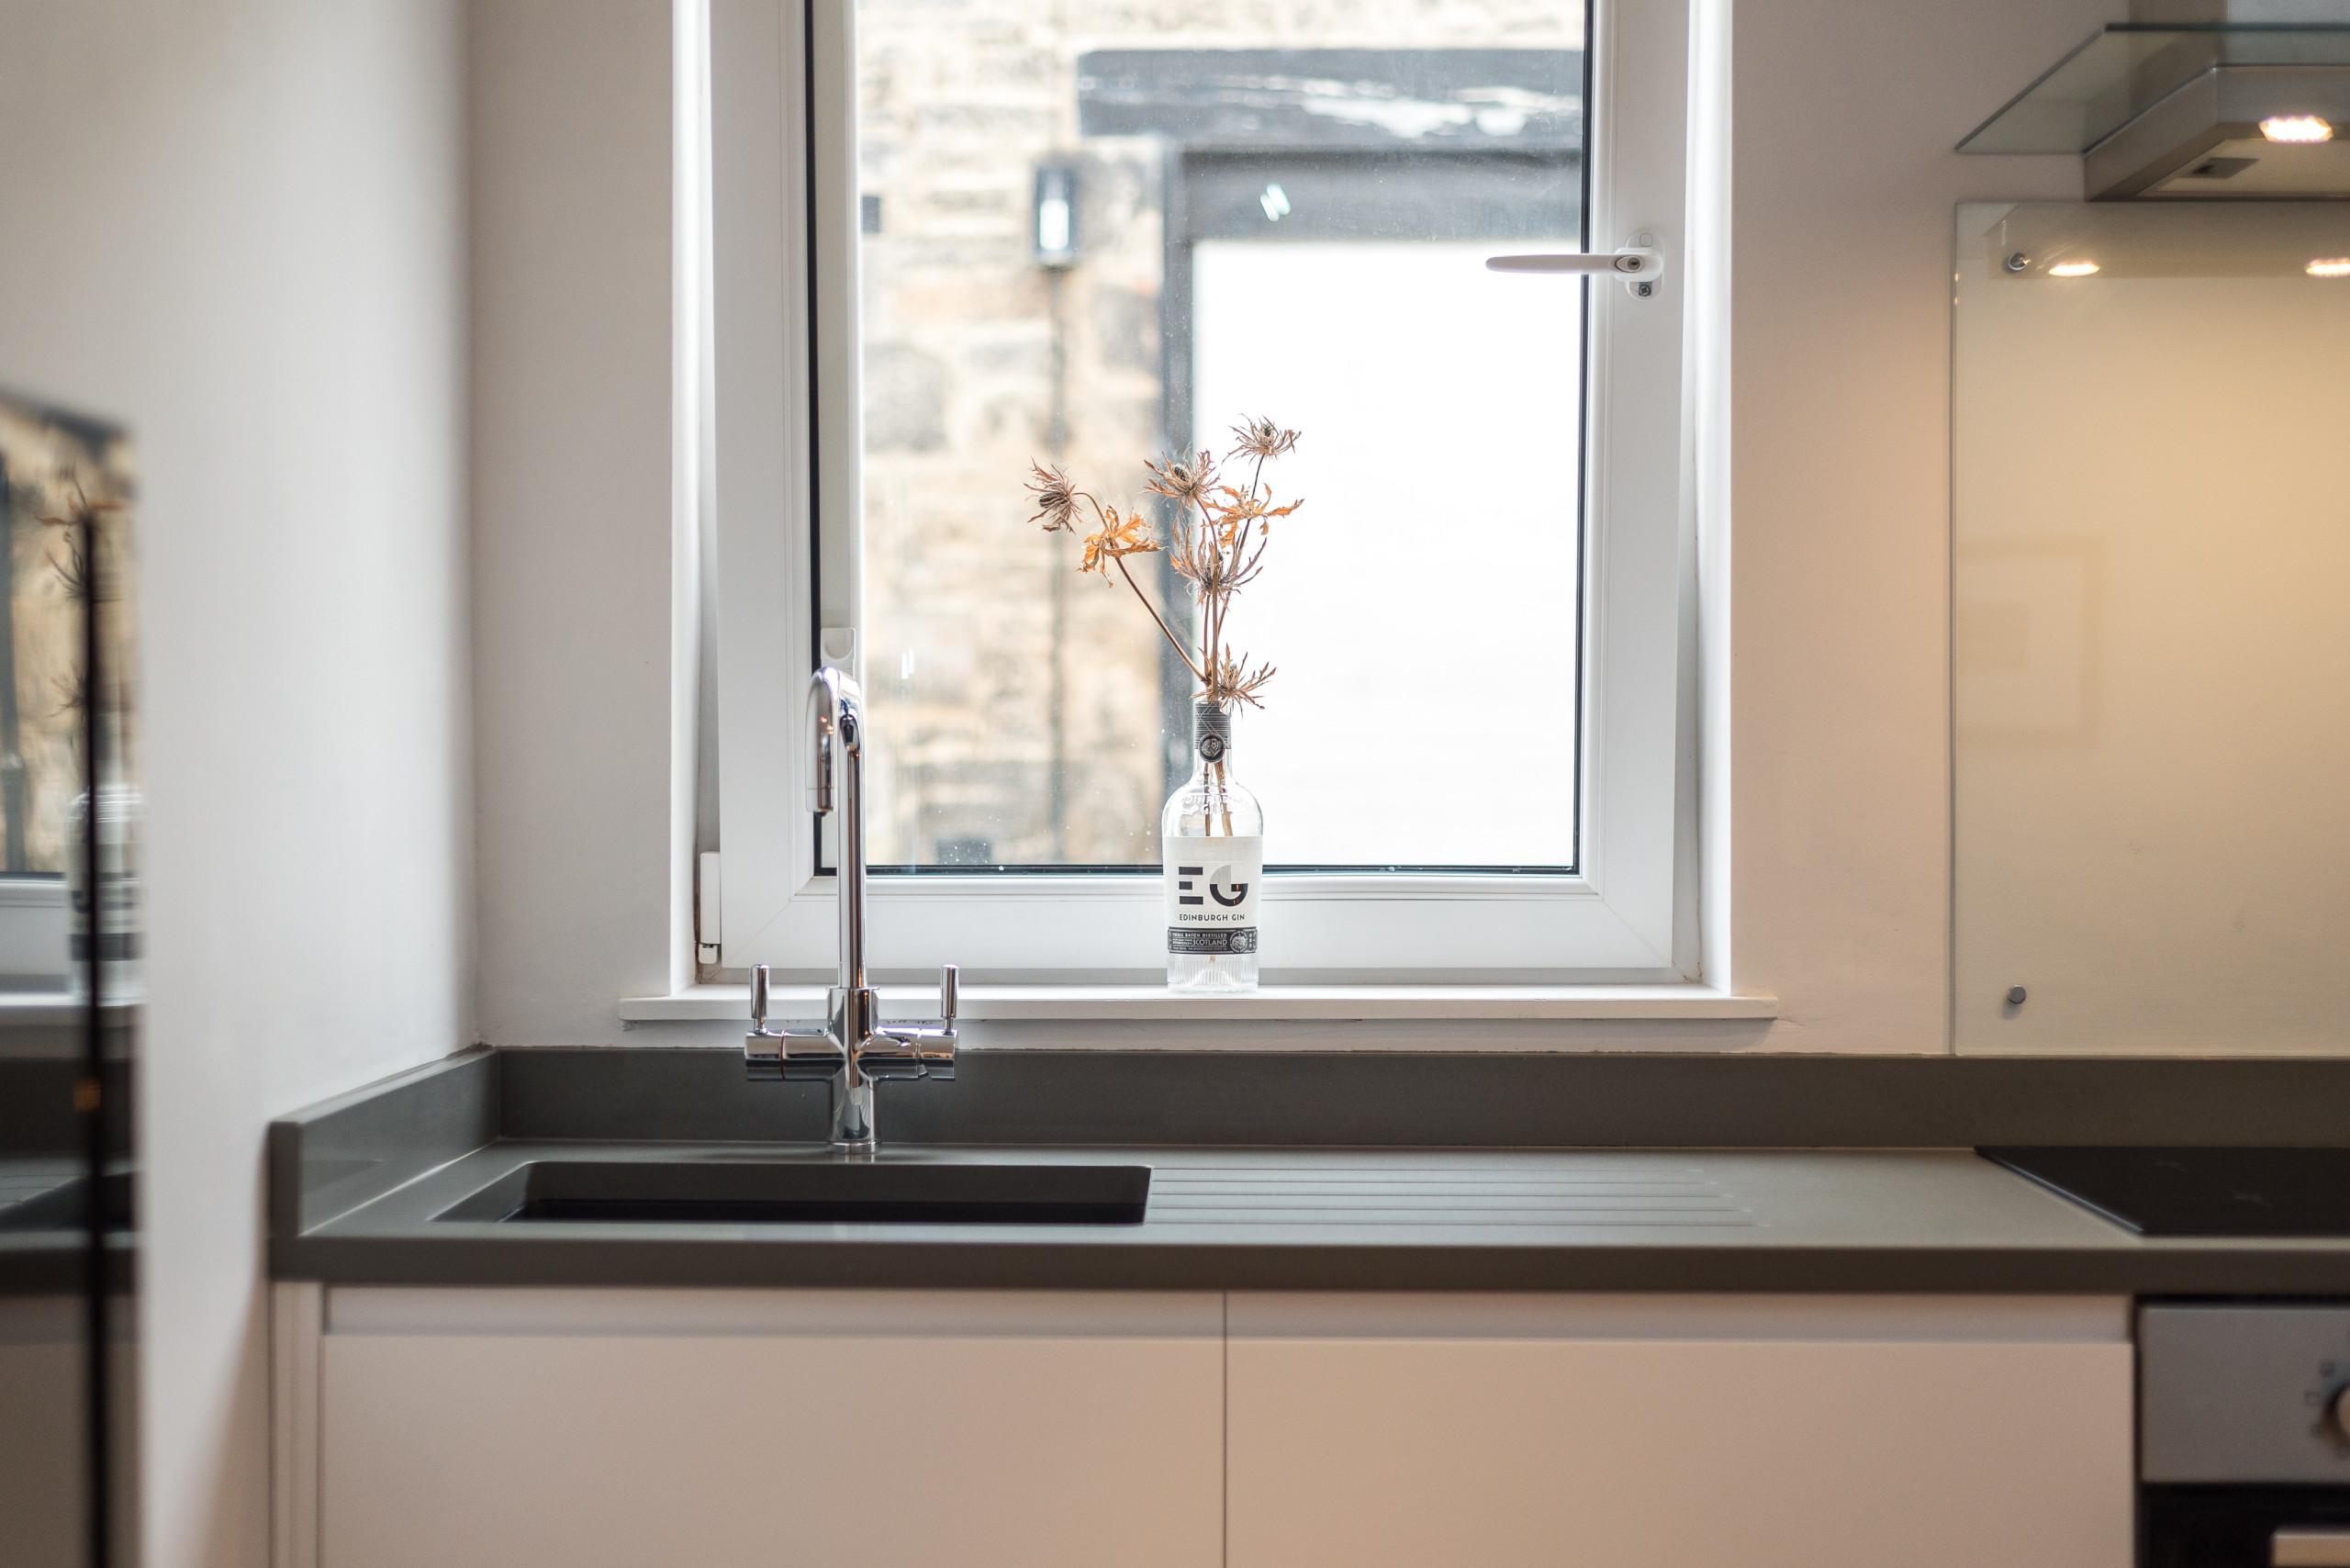 Alterations and Renovation of Mews Apartment, Edinburgh